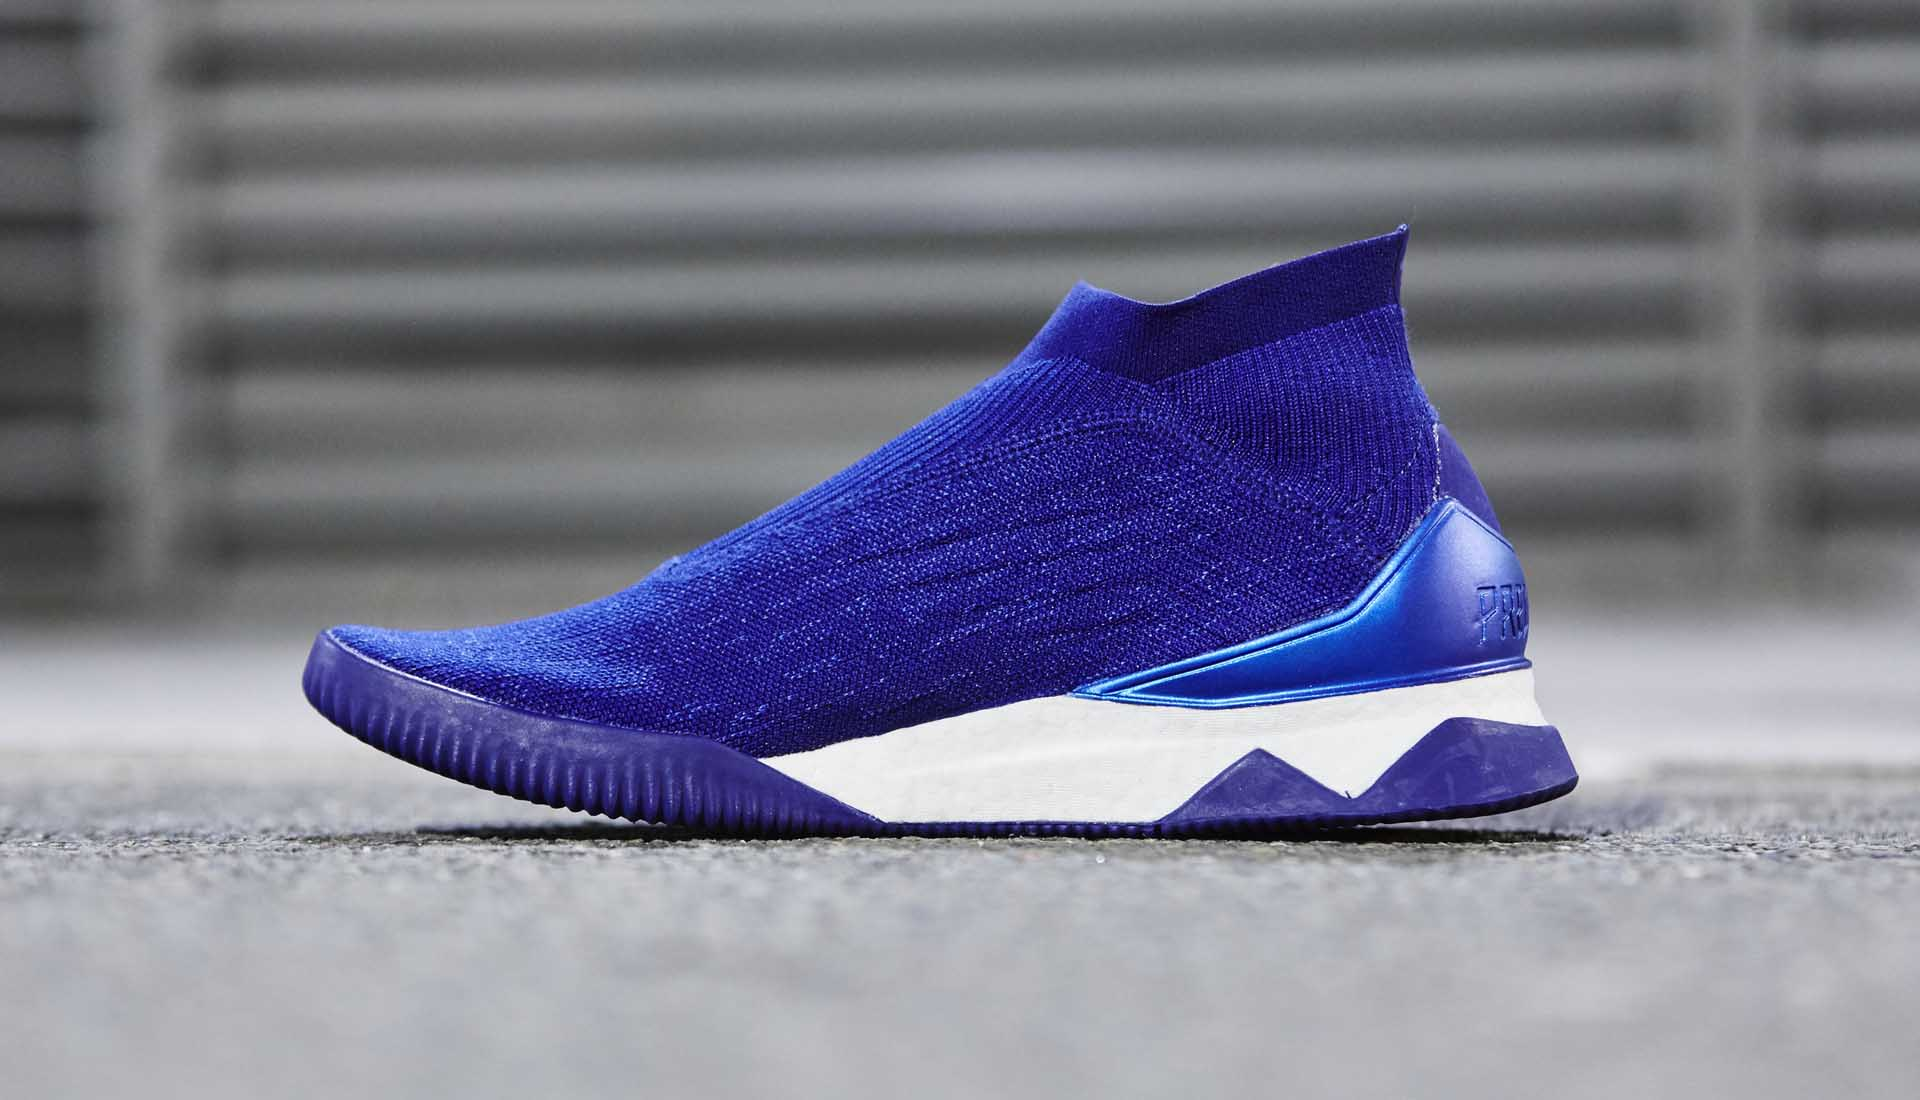 sneakers-adidas-Predator-Tango-18-UltraBoost-Deadly-Strike-img4